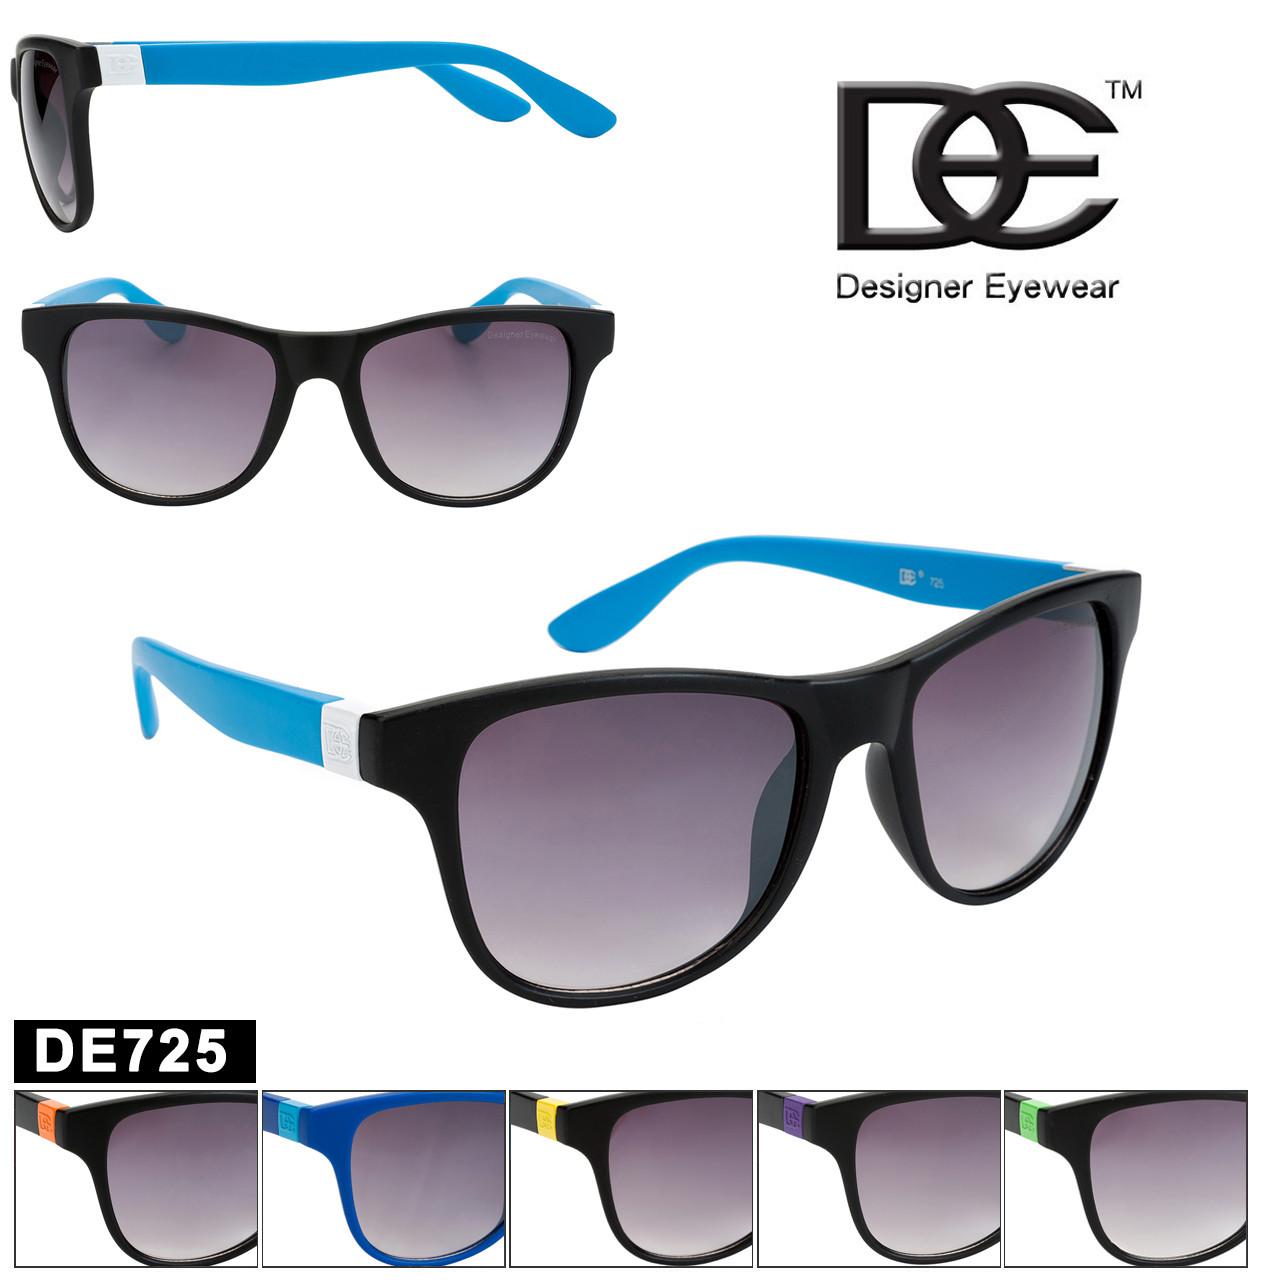 DE™ Designer Eyewear Wholesale Sunglasses - Style # DE725